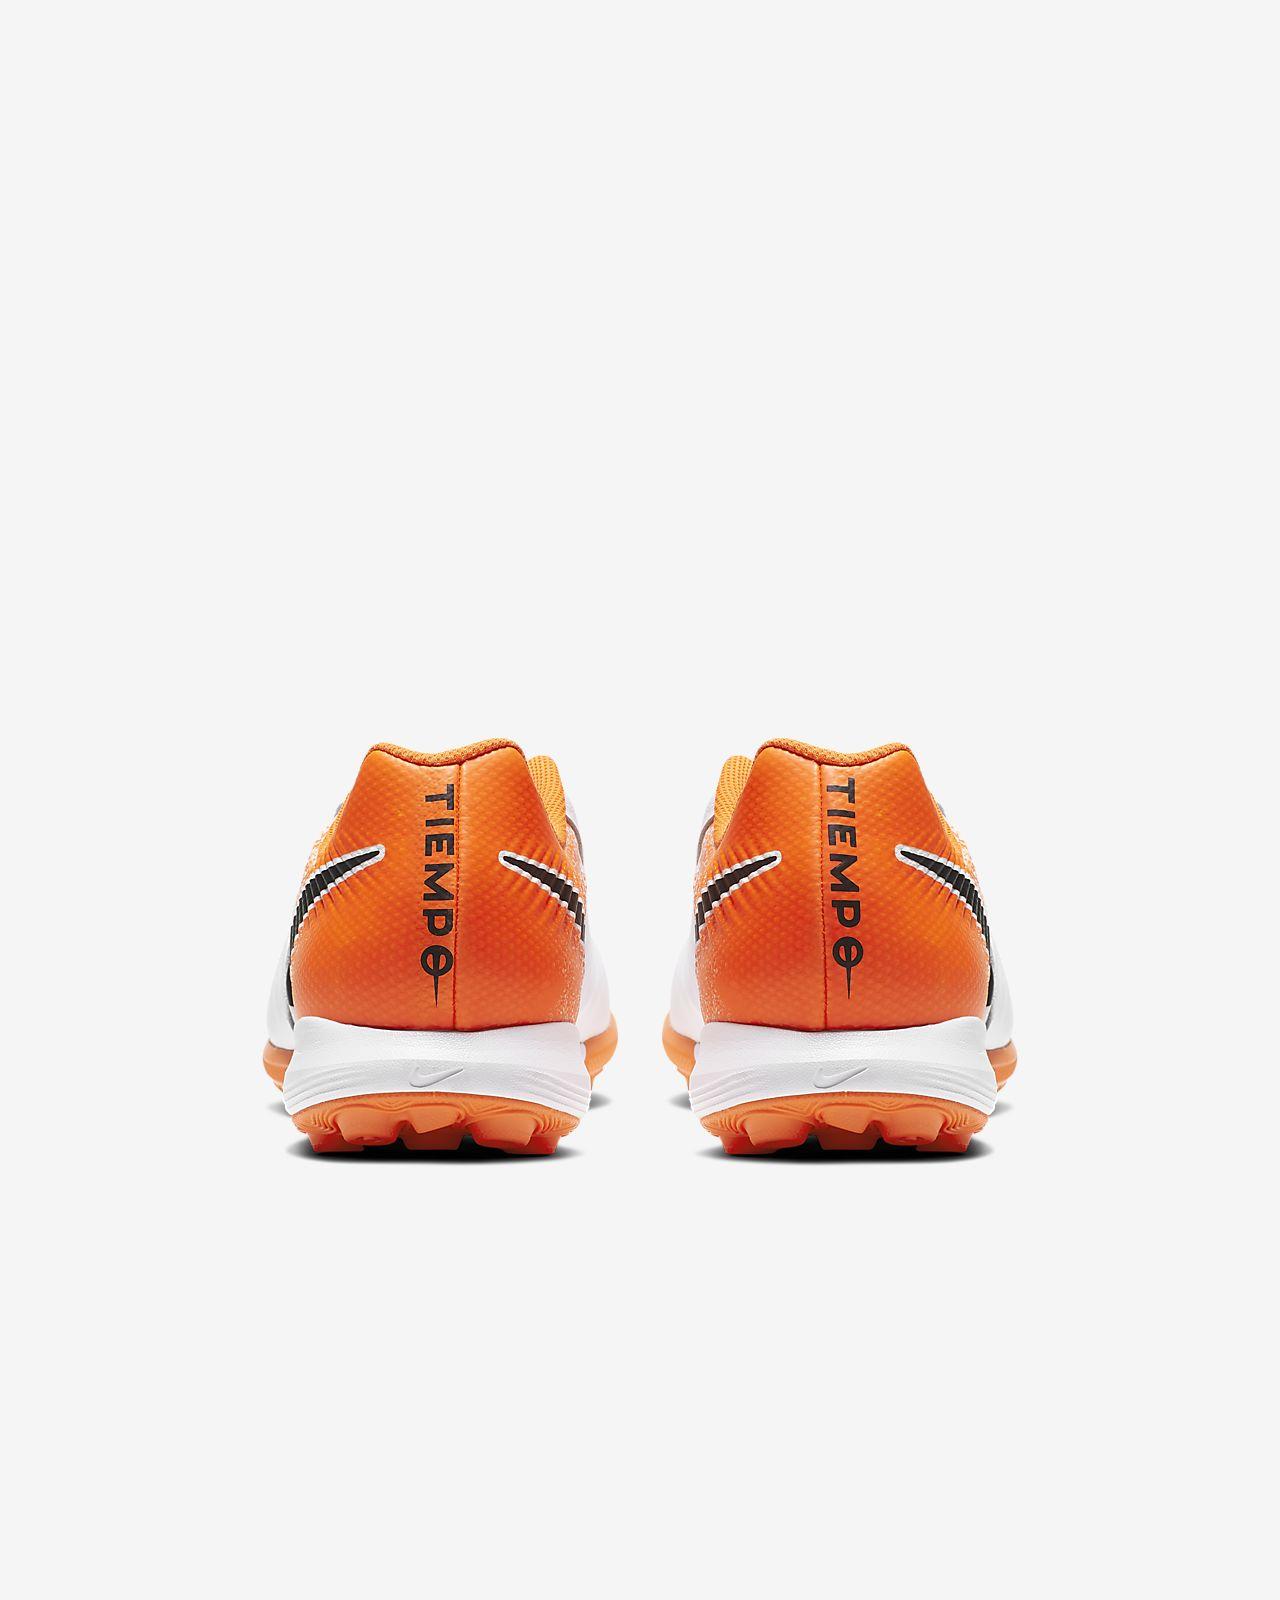 1afbc0e9556 Nike TiempoX Lunar Legend VII Pro Turf Football Boot. Nike.com ZA